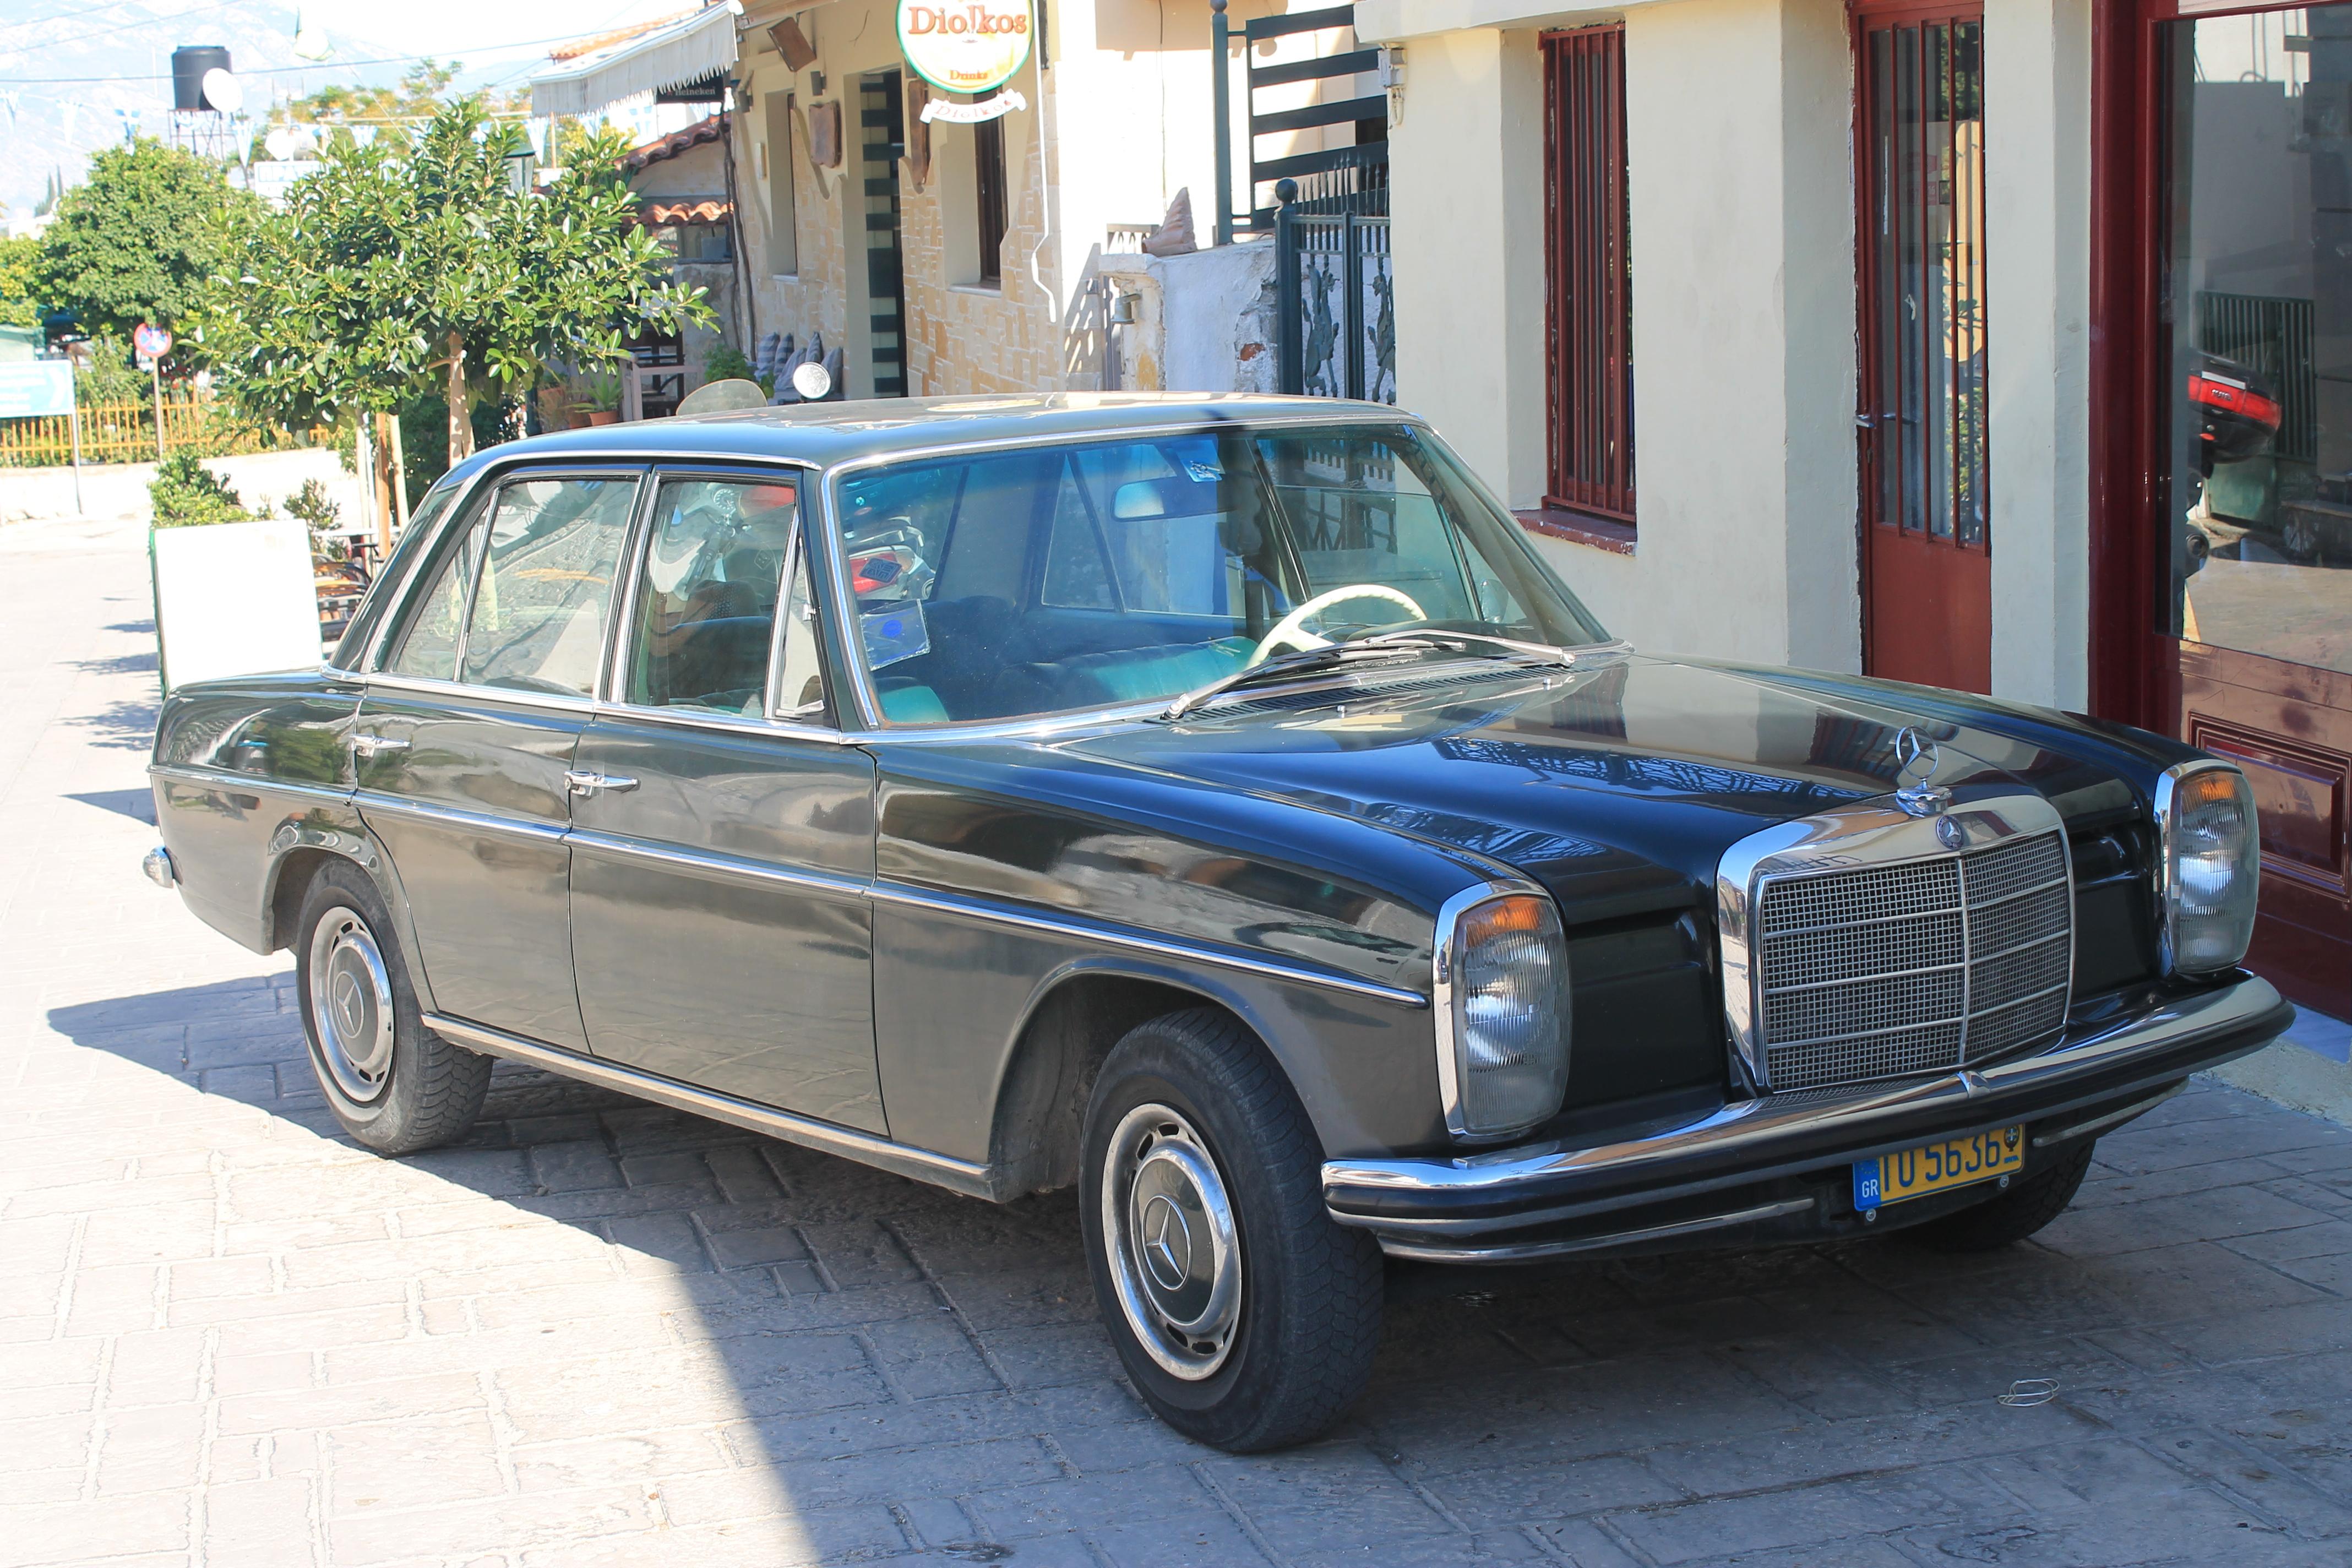 File:1968-73 Mercedes Benz W115 200 (10388555076).jpg - Wikimedia Commons